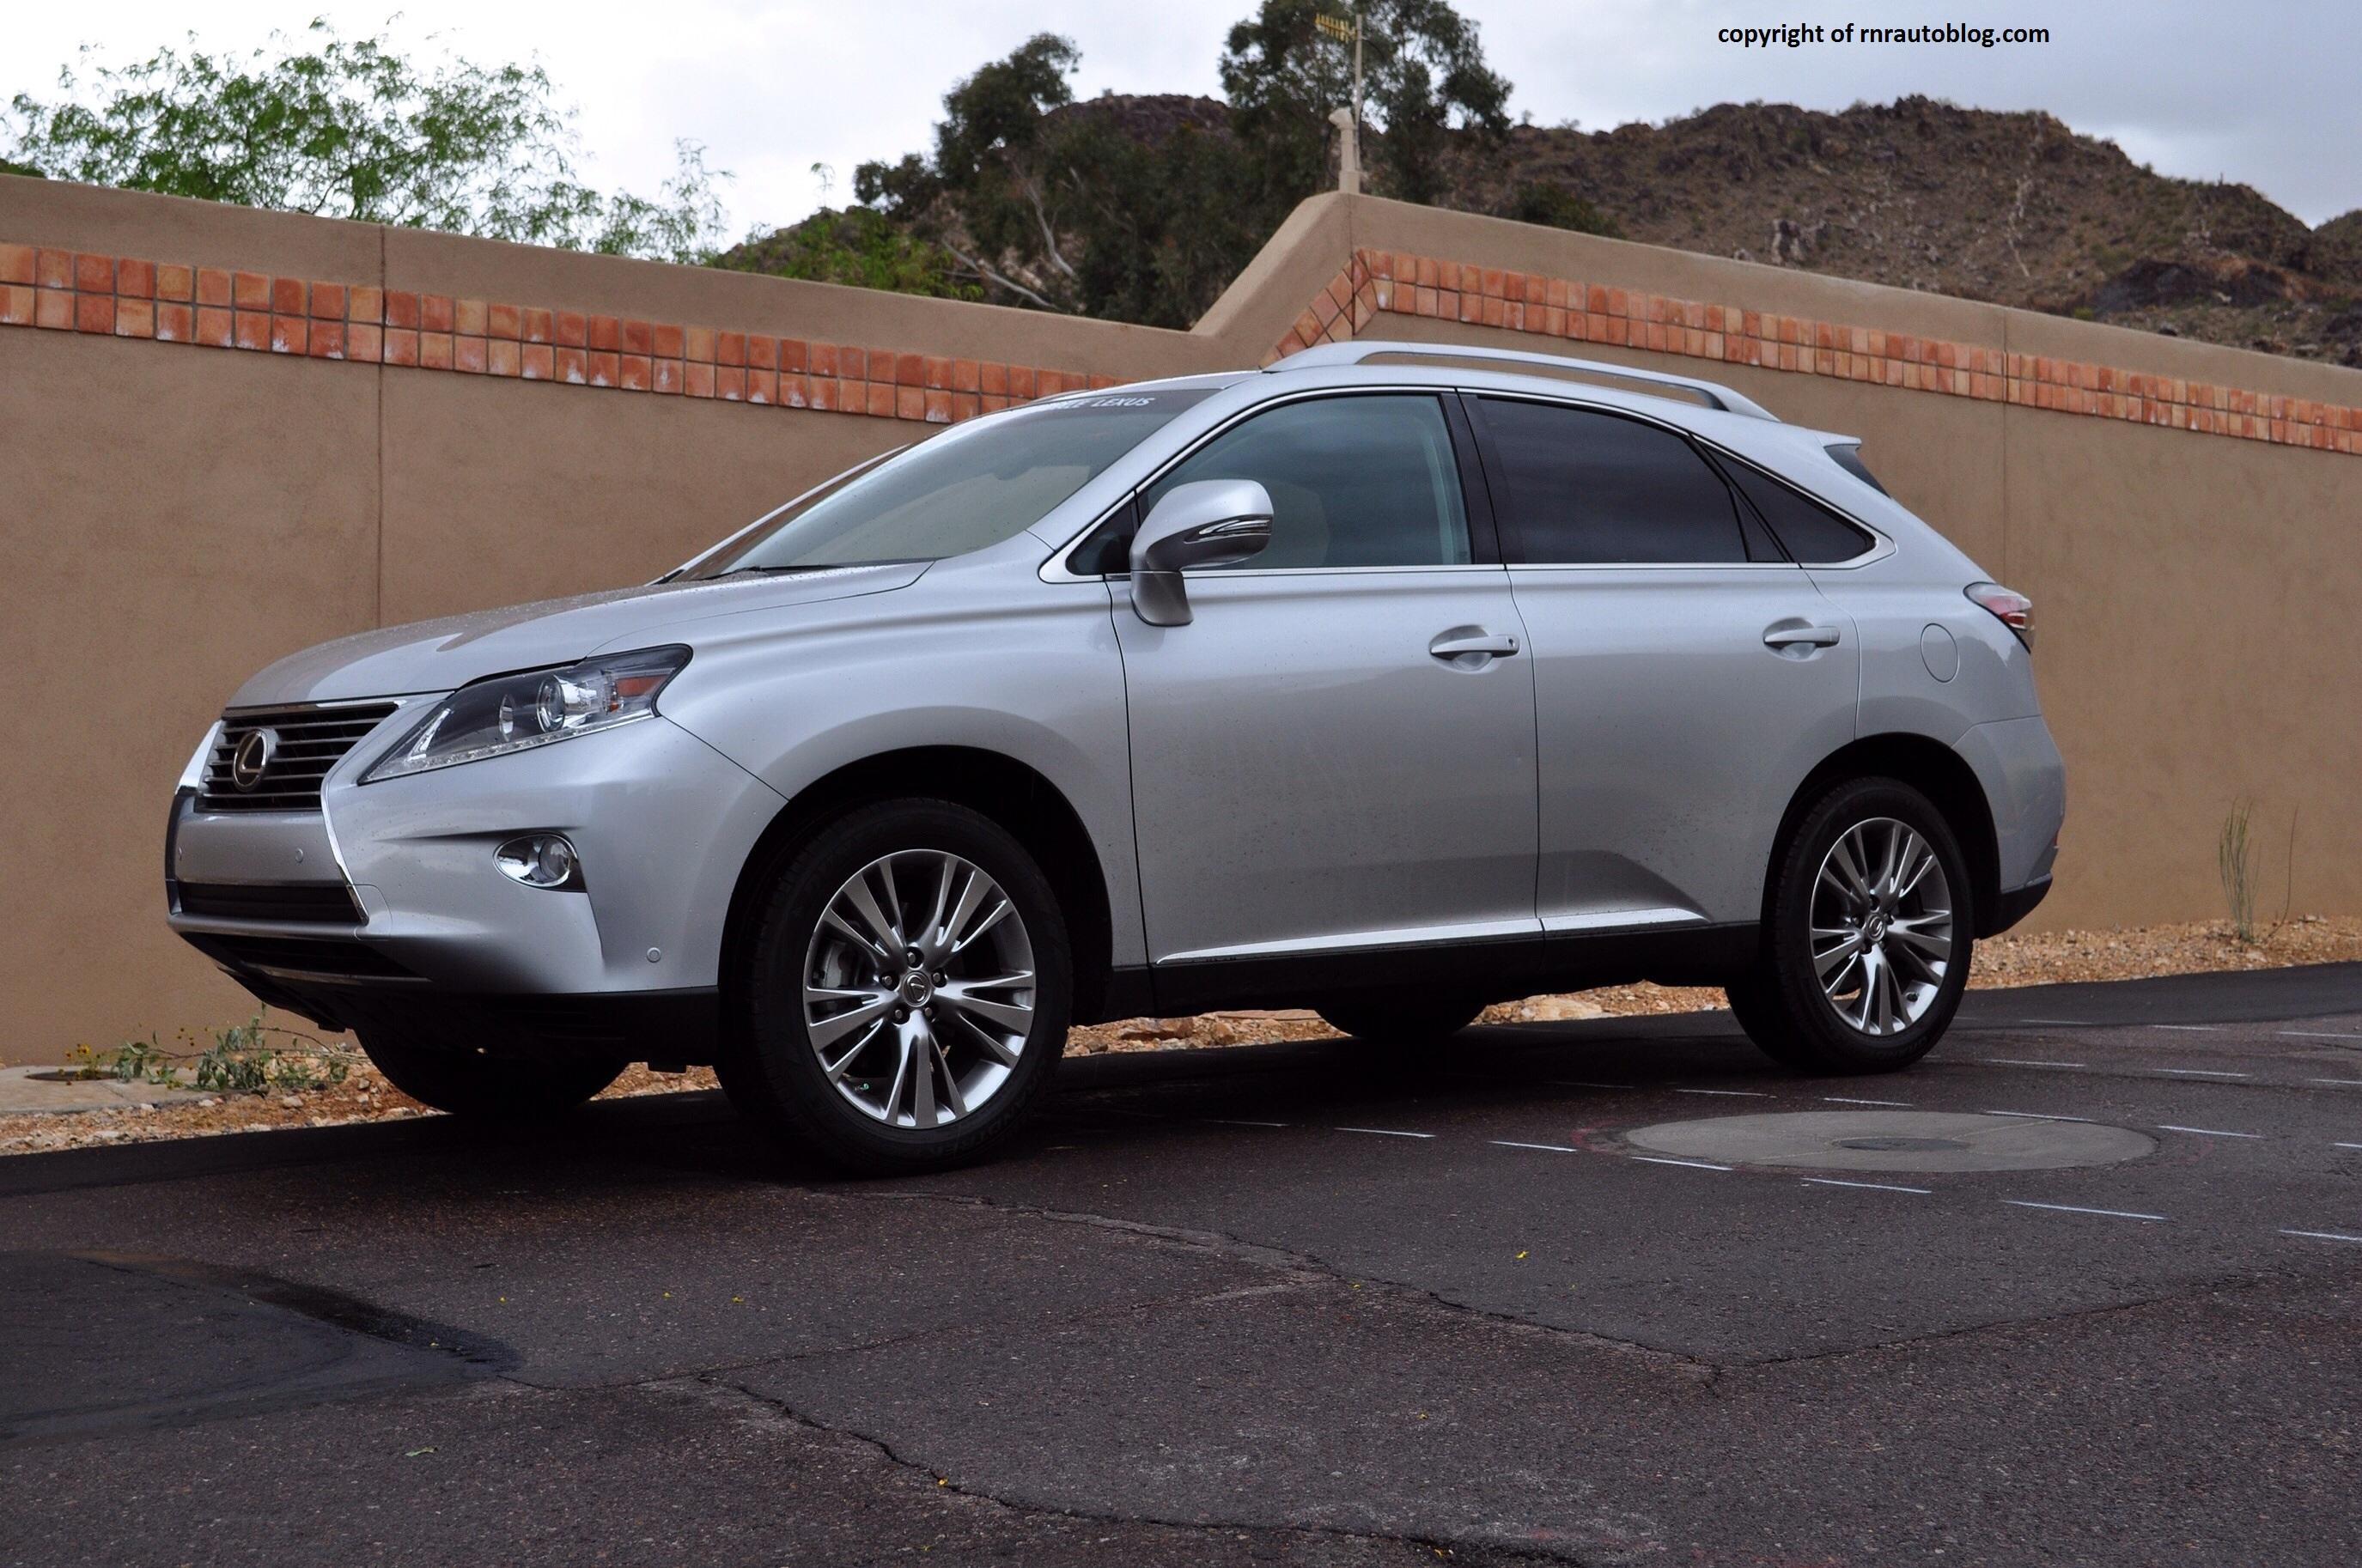 new suv lexus review car nx